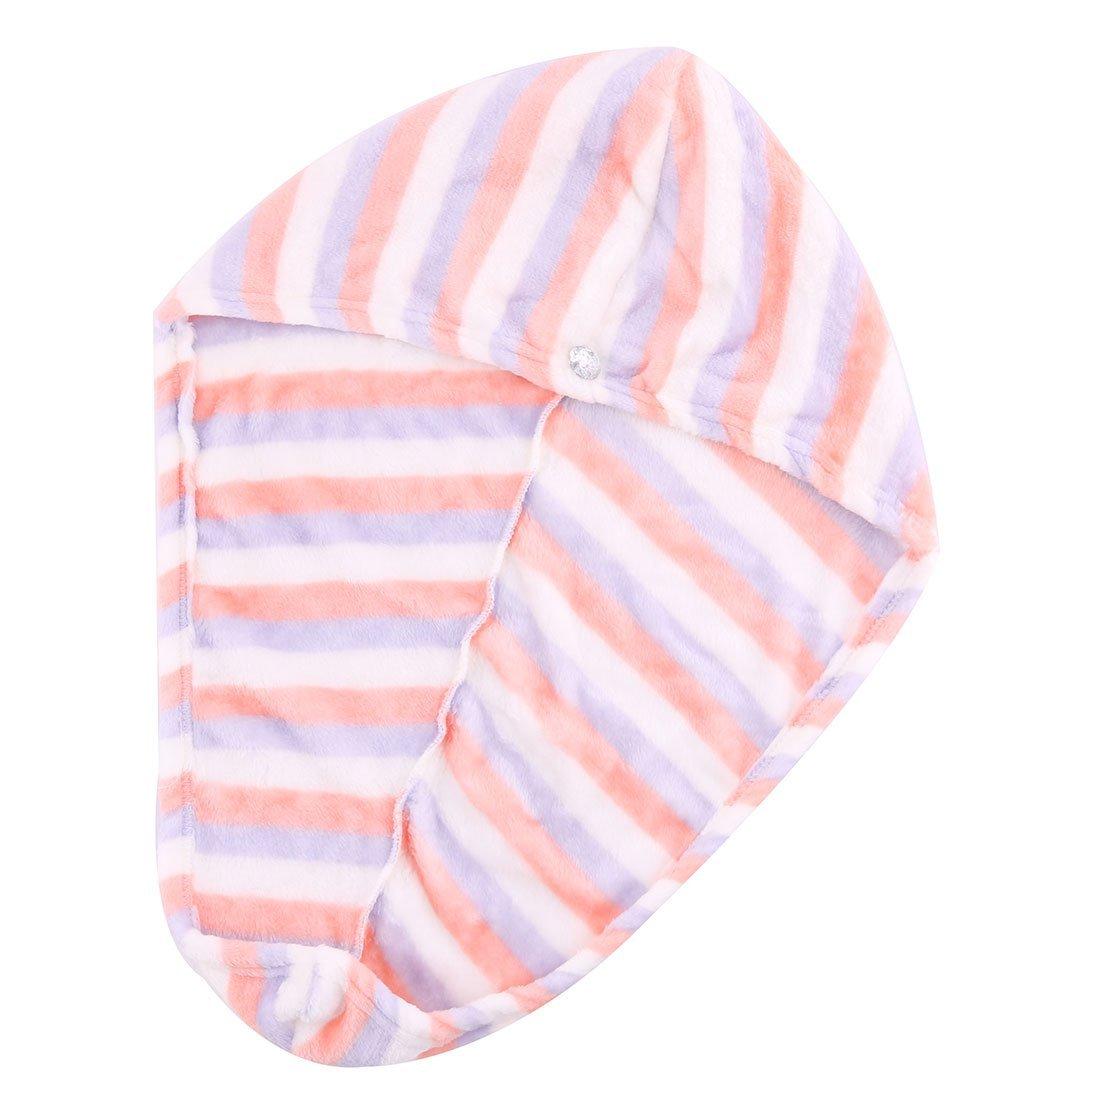 Amazon.com: eDealMax Señora franela a Rayas patrón de triángulo botón en Forma de toalla cierre de tapa Hiar seco Sombrero: Home & Kitchen